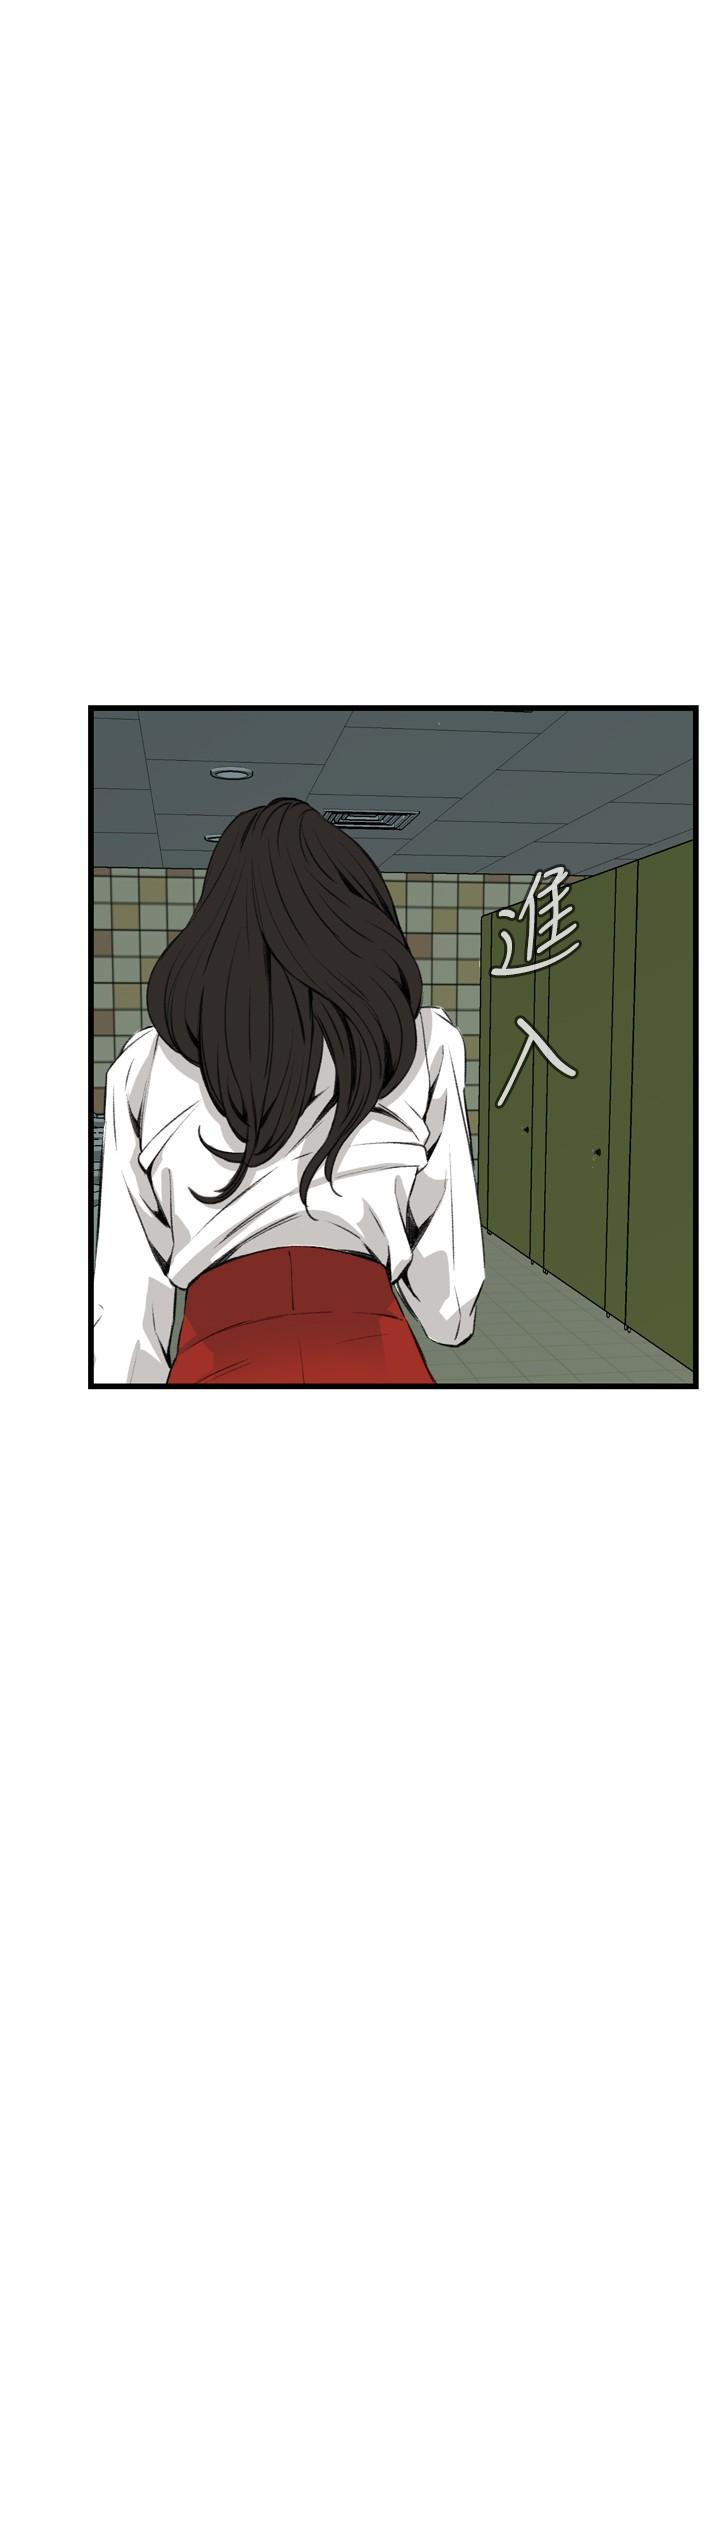 Take a Peek 偷窥 Ch.39~60 [Chinese]中文 361